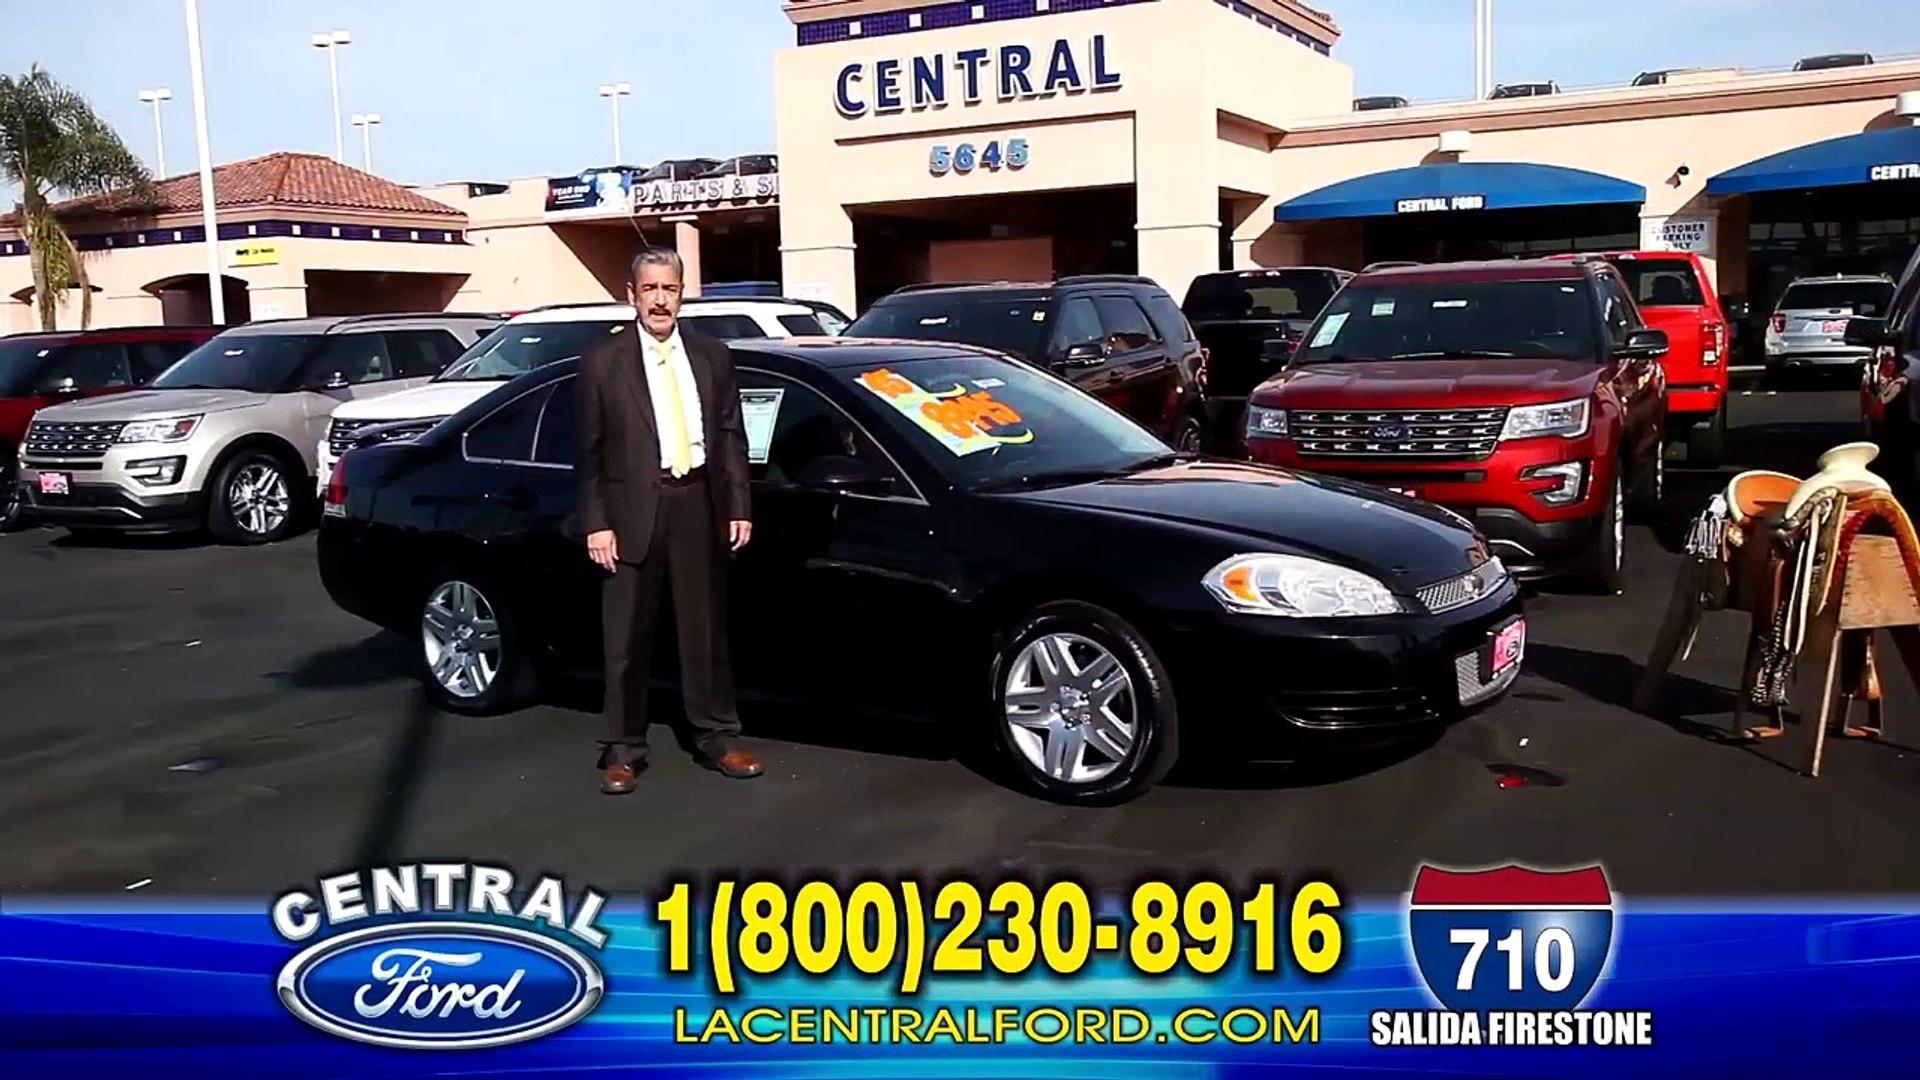 2013 Chevy Impala Long Beach, CA   Chevy Impala Long Beach, CA